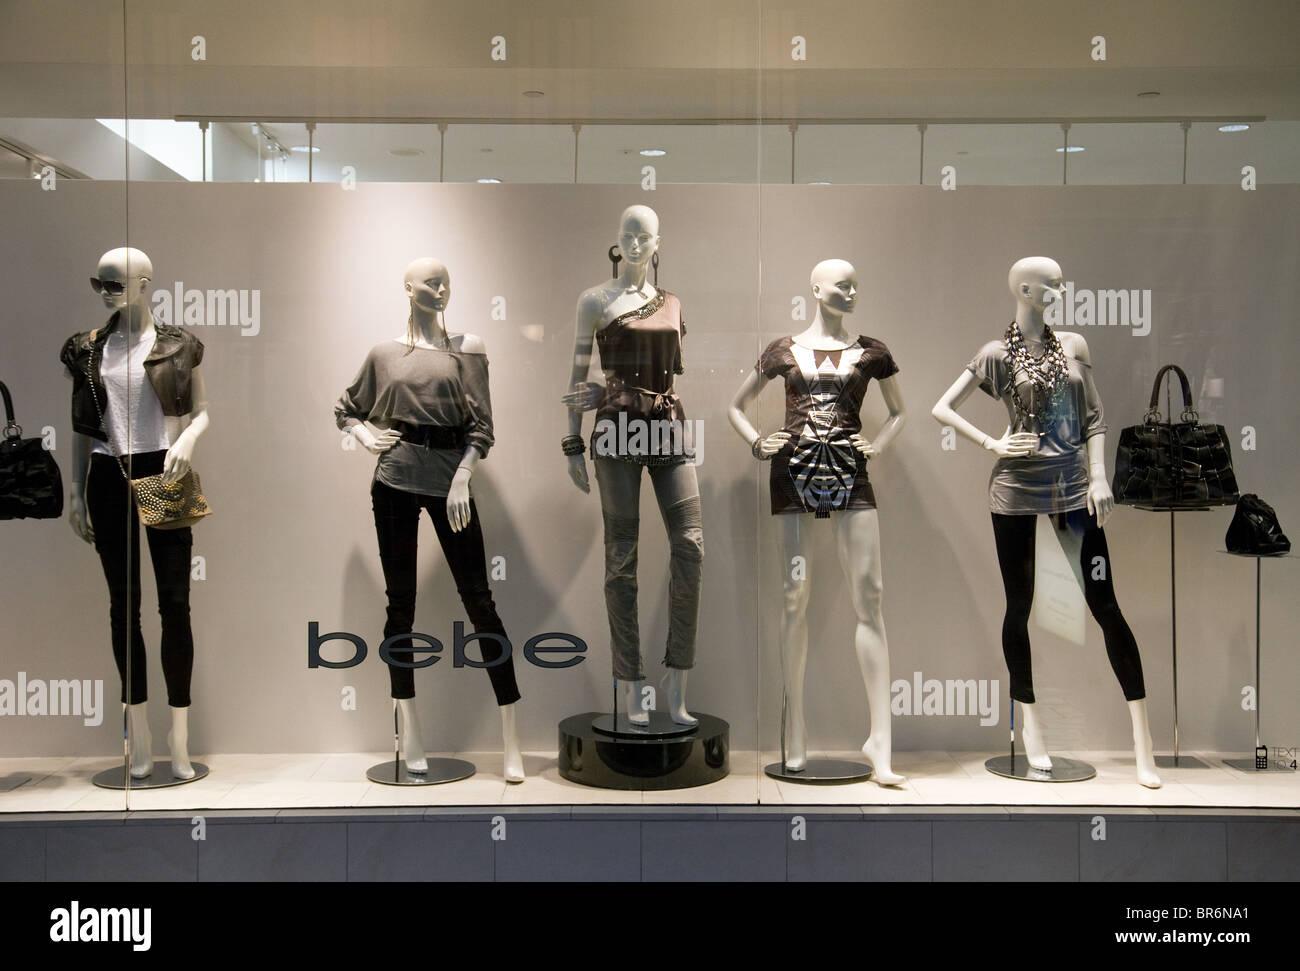 Clothing stores las vegas